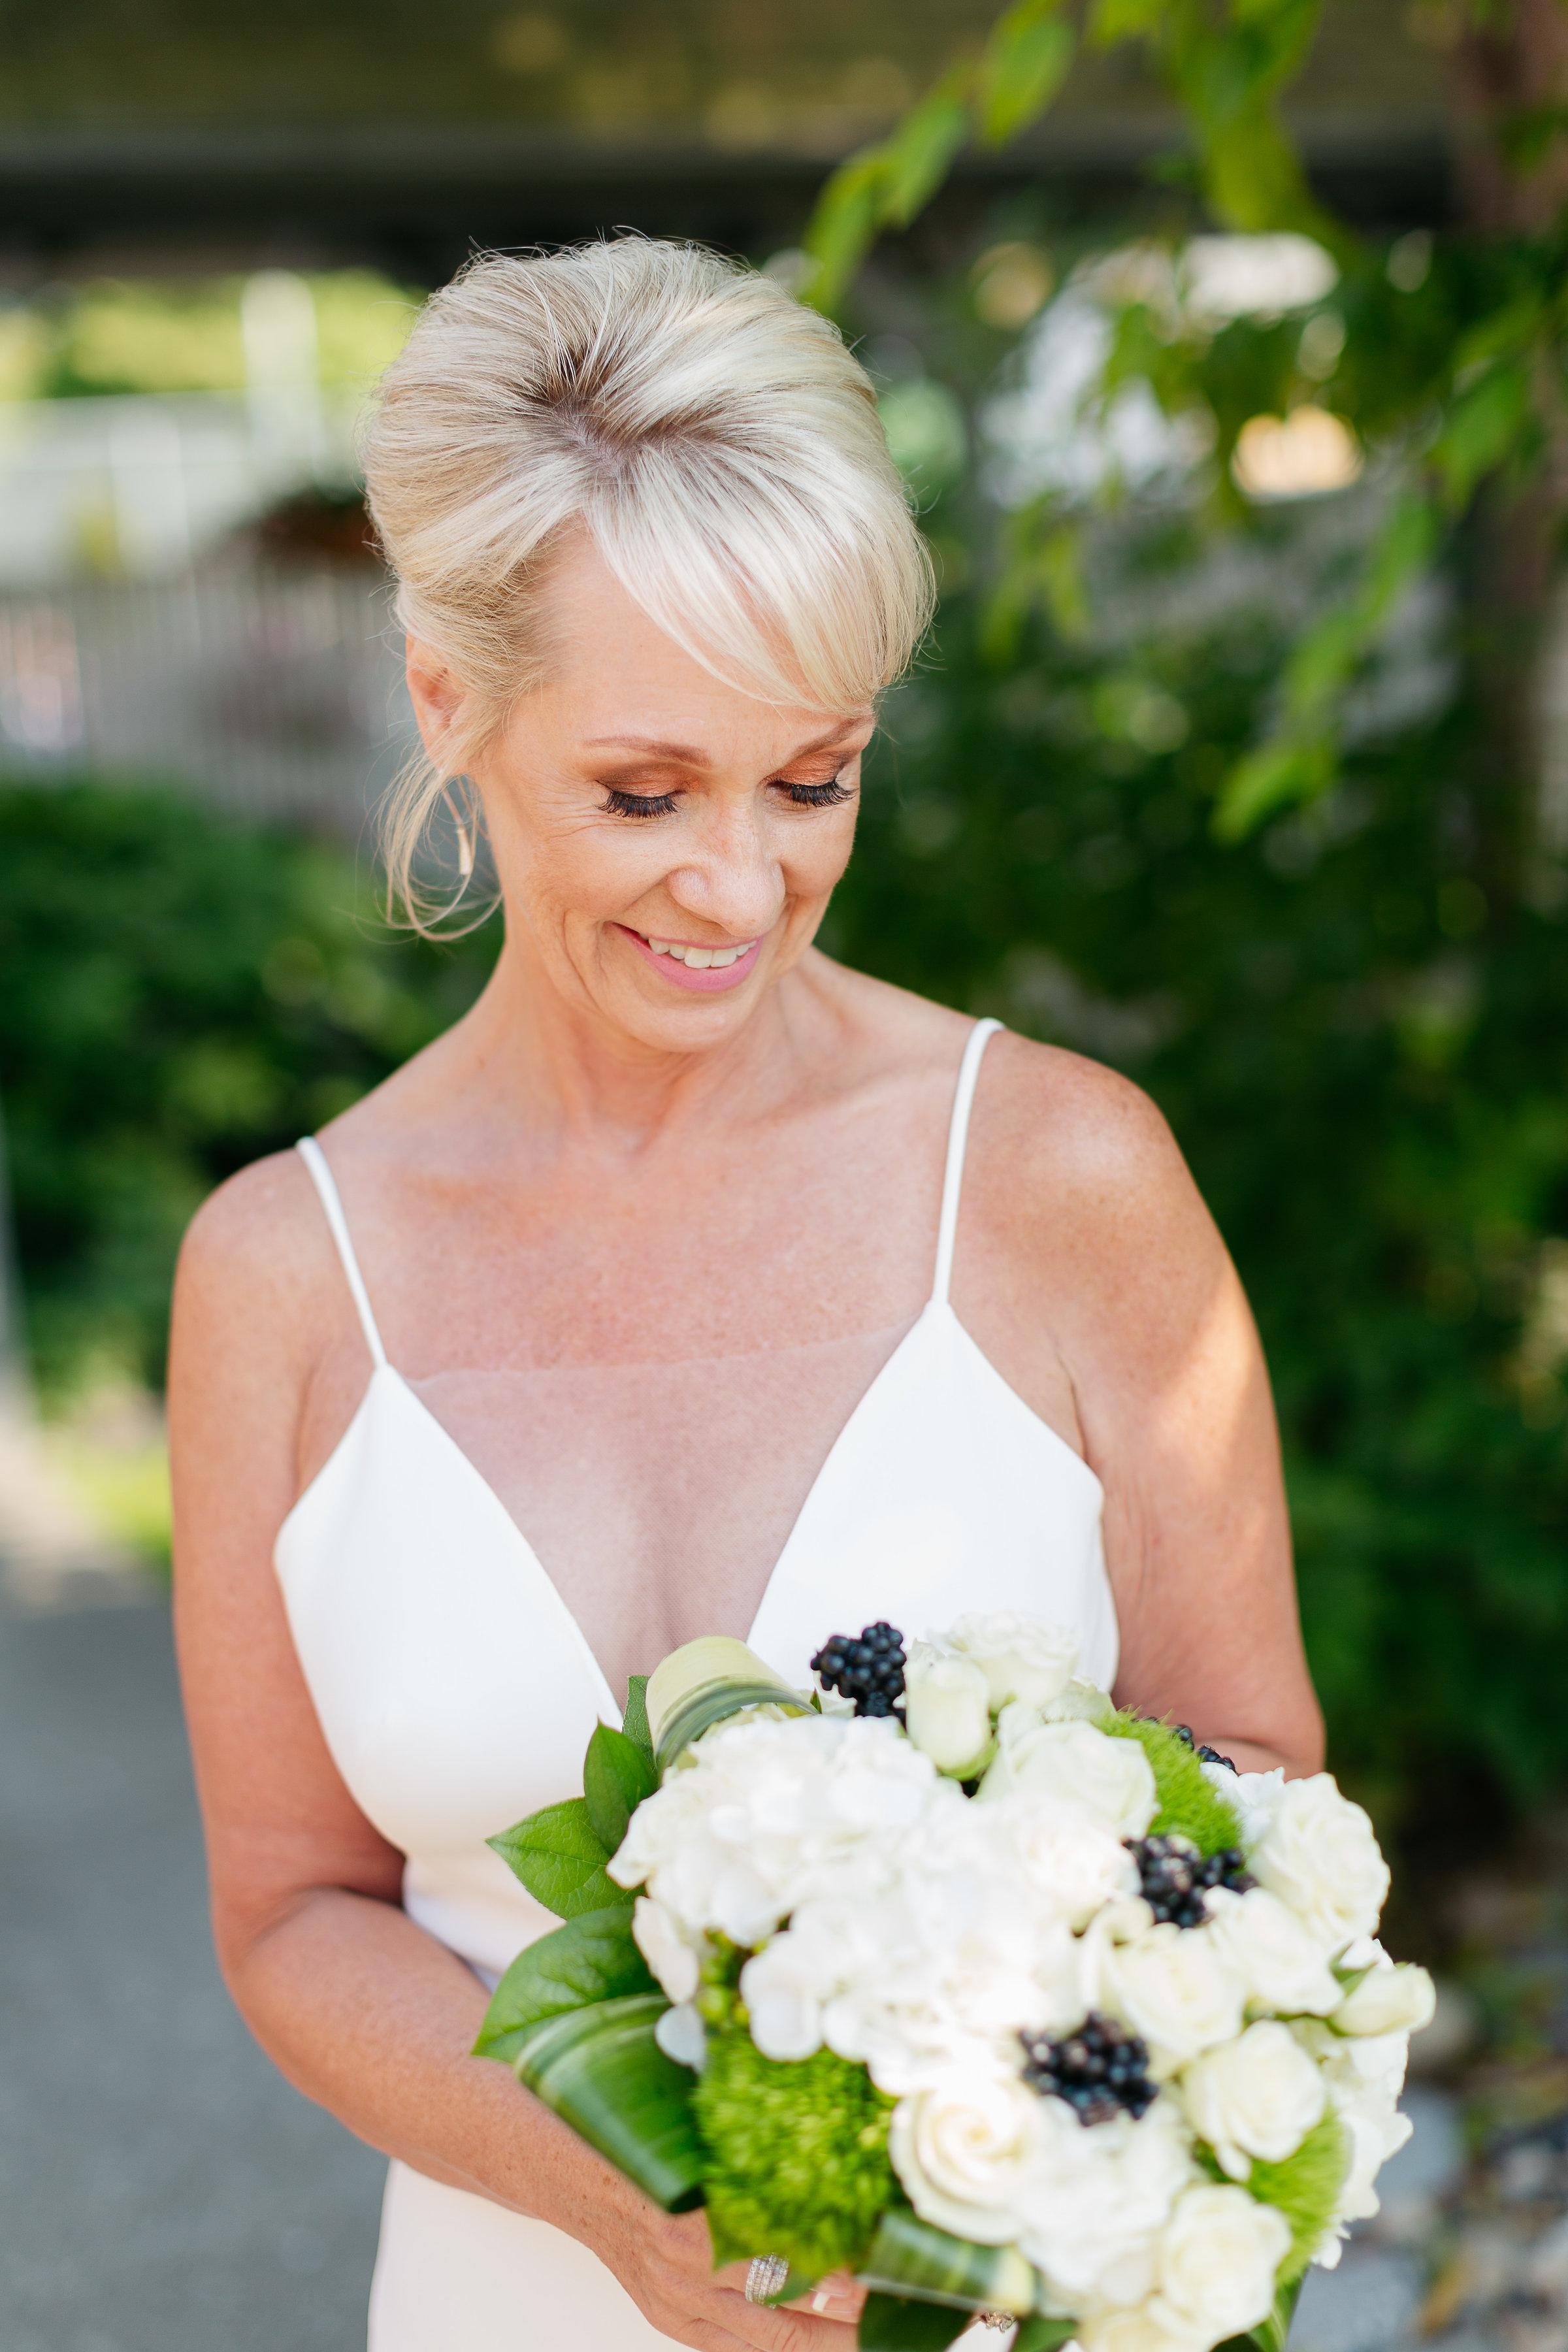 Bellingham bridal hair stylist, makeup artist, Hotel Bellweather